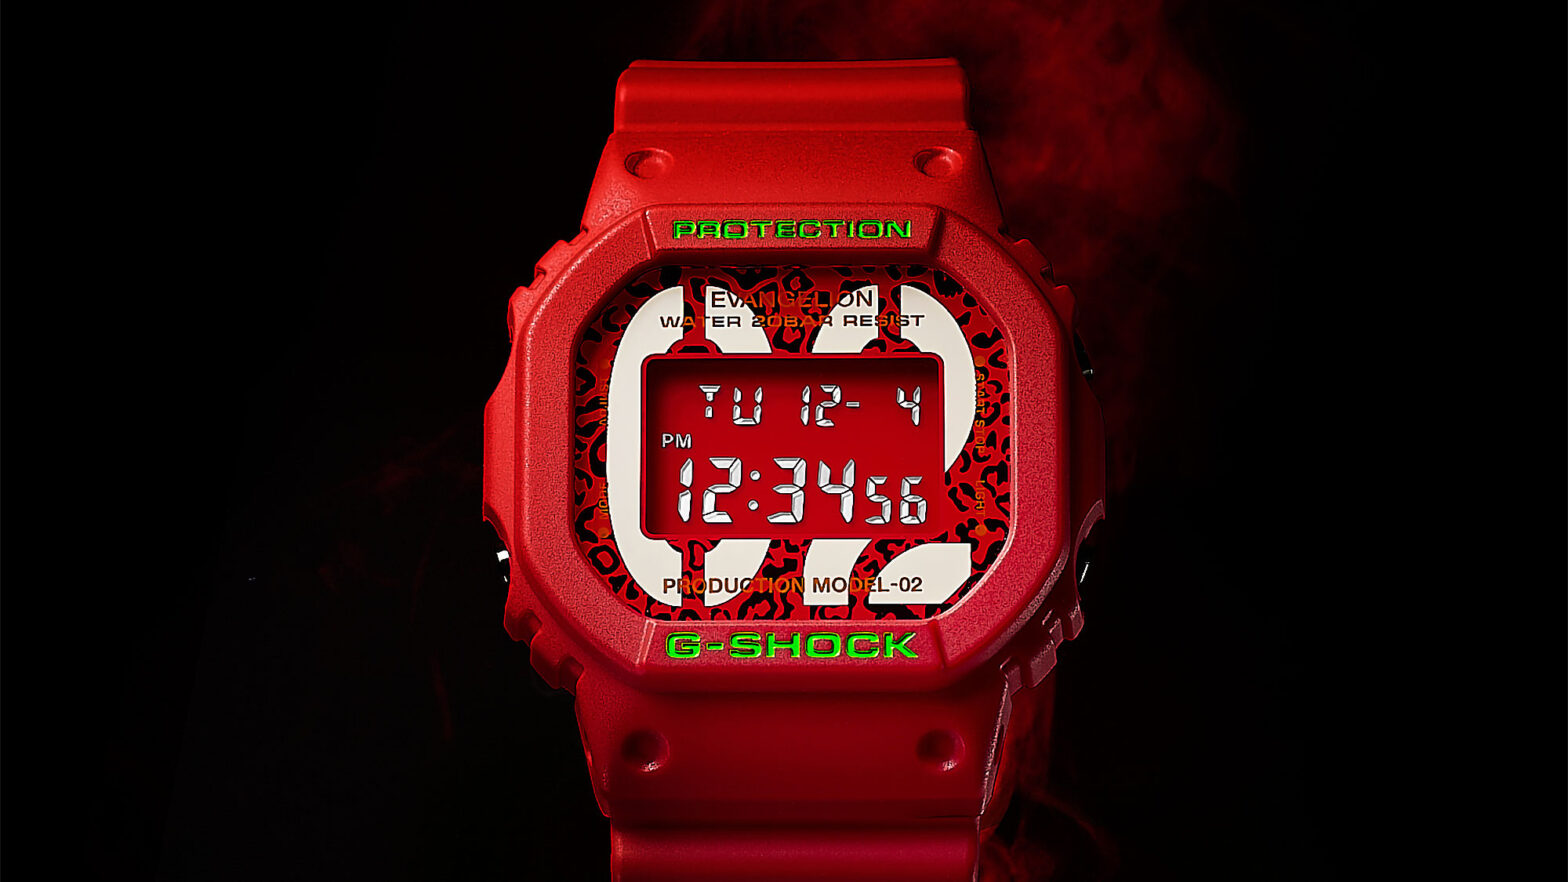 G-Shock DW-5600 EVA-02 The Beast Wrist Watch